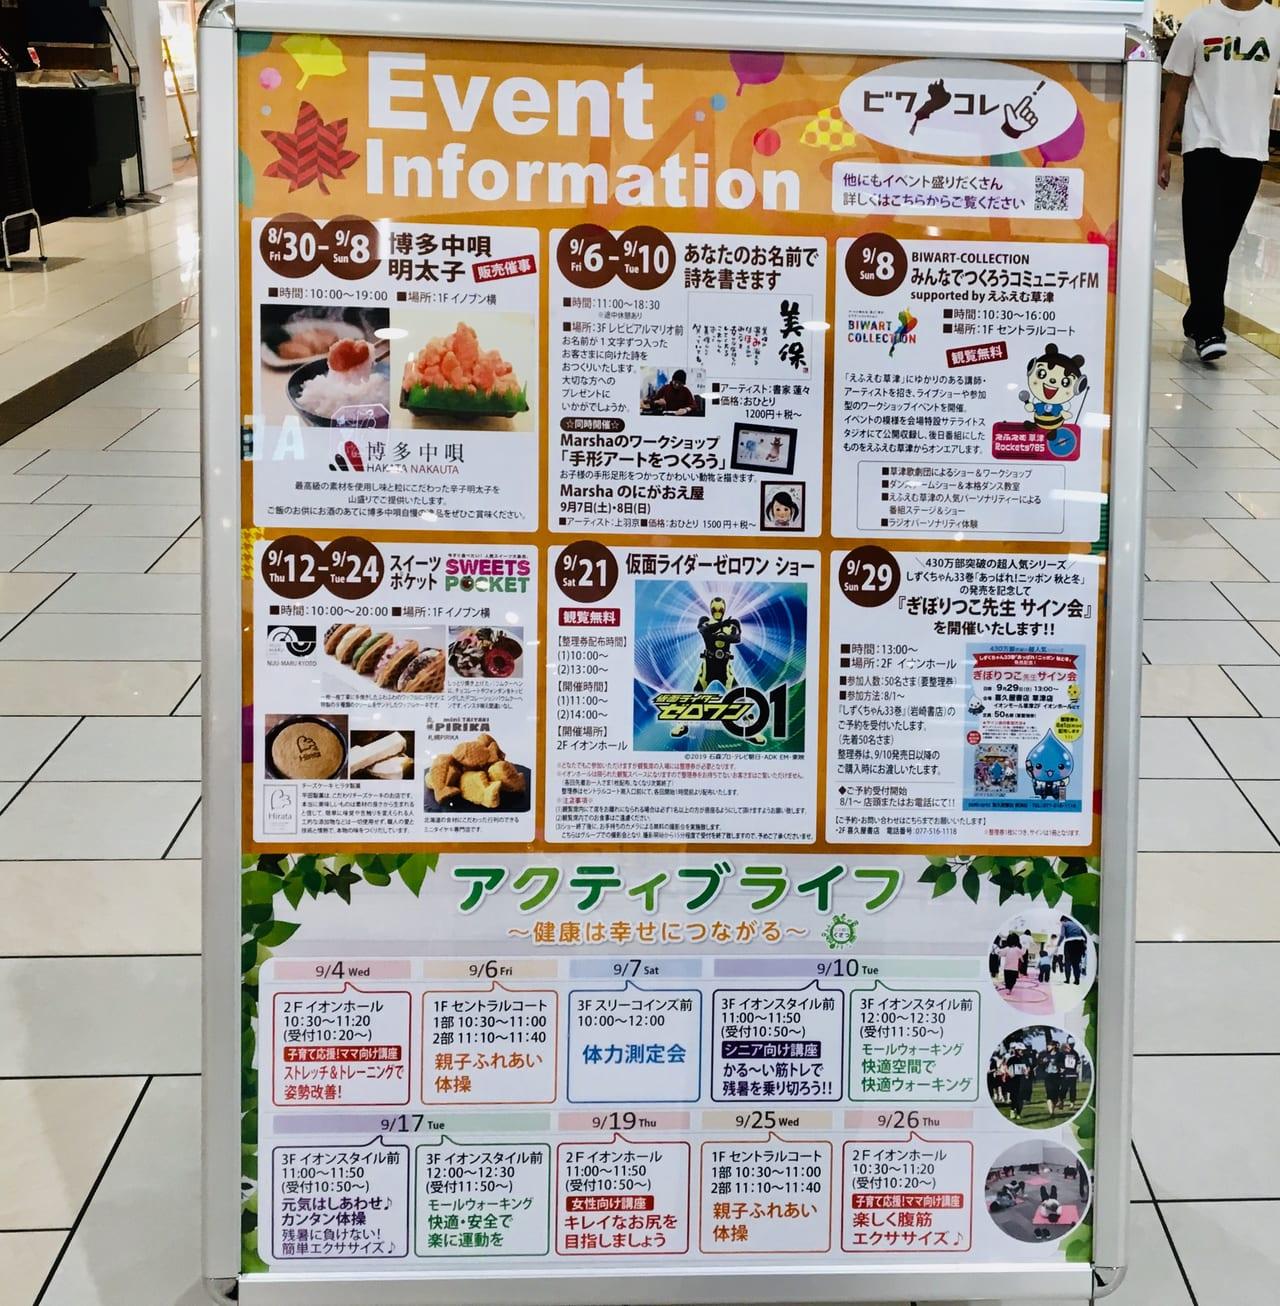 9 event